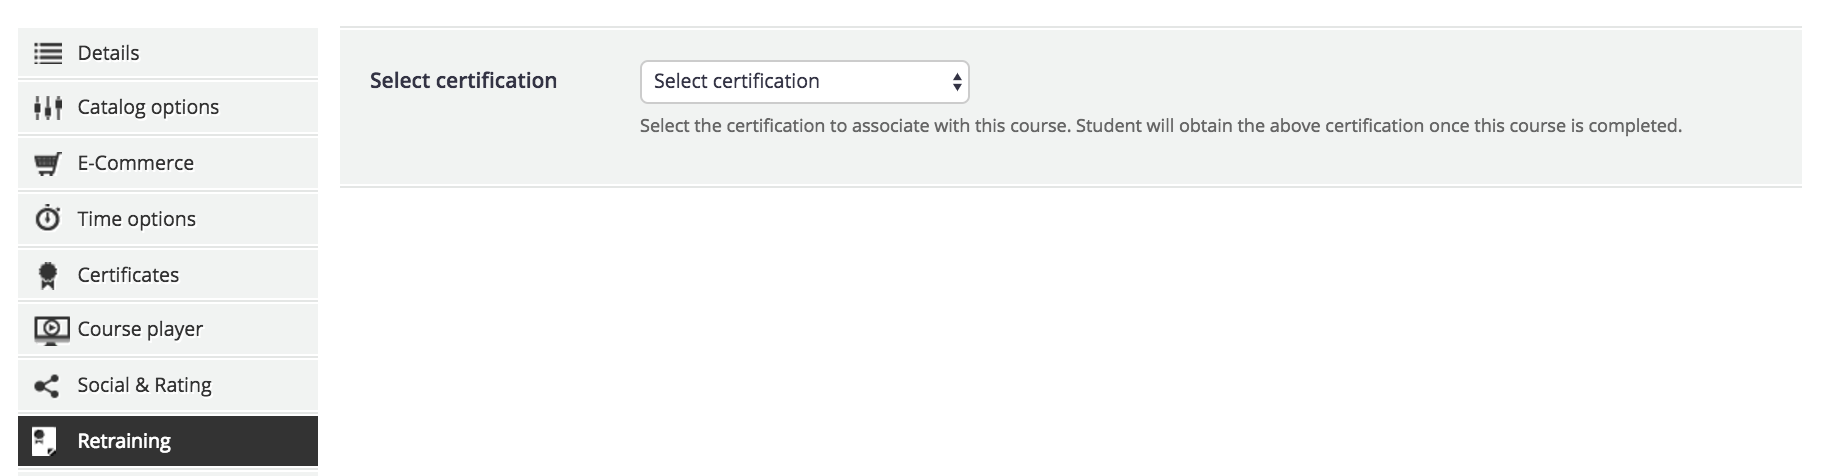 course advanced options retraining